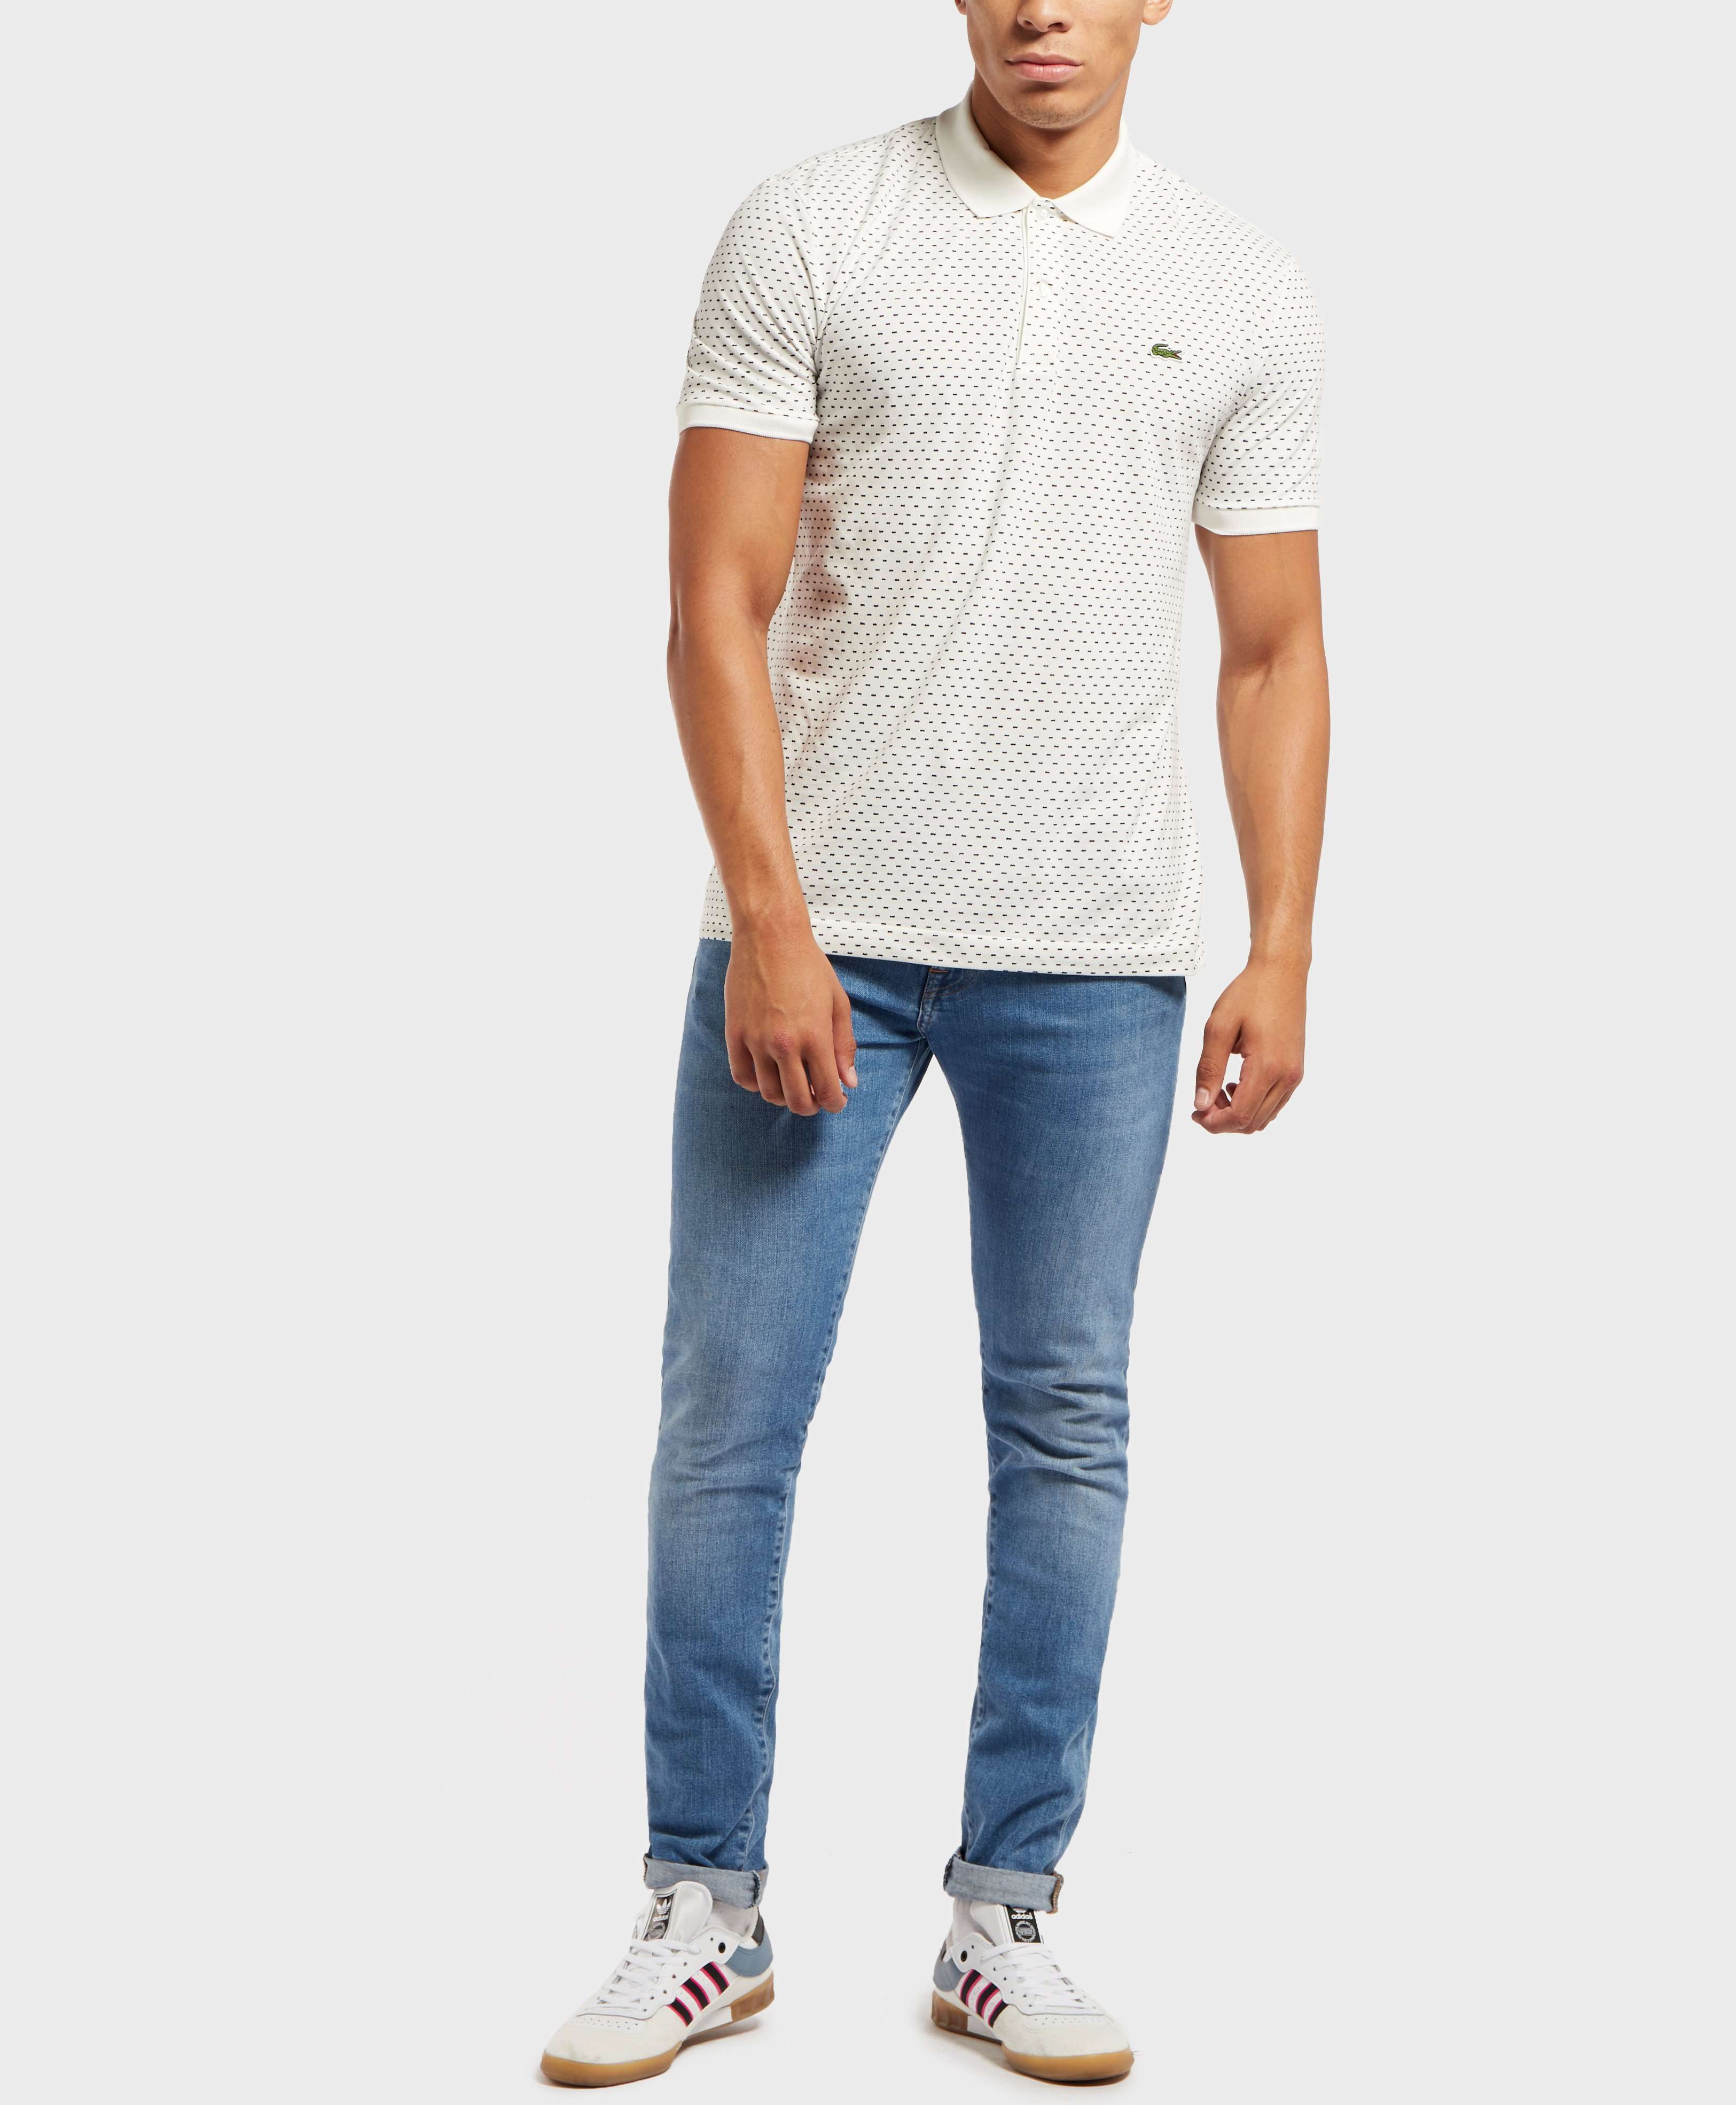 Lacoste Dash Print Short Sleeve Polo Shirt - Exclusive